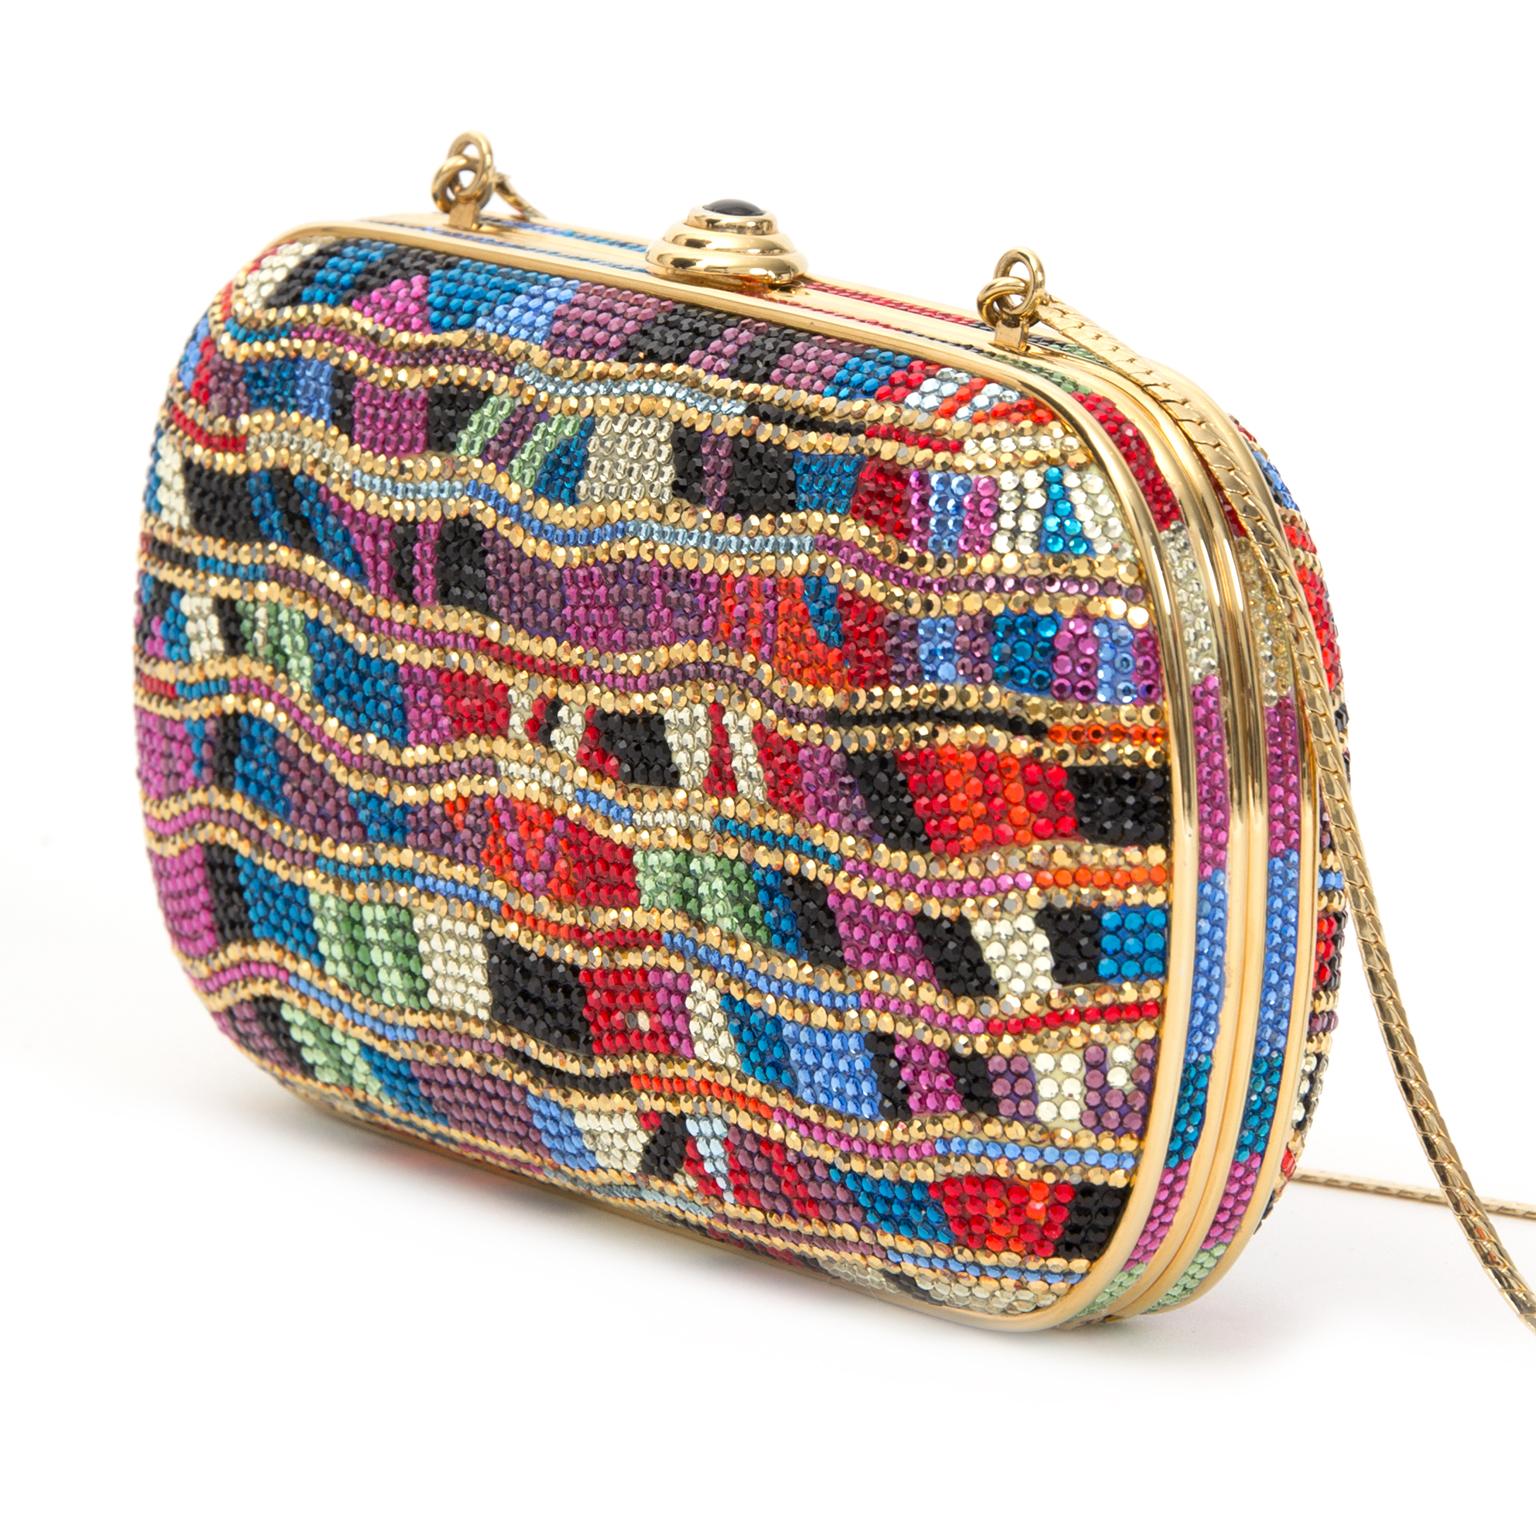 designer Judith Leiber Swarovski Crystal Multicolored Minaudiere like new online